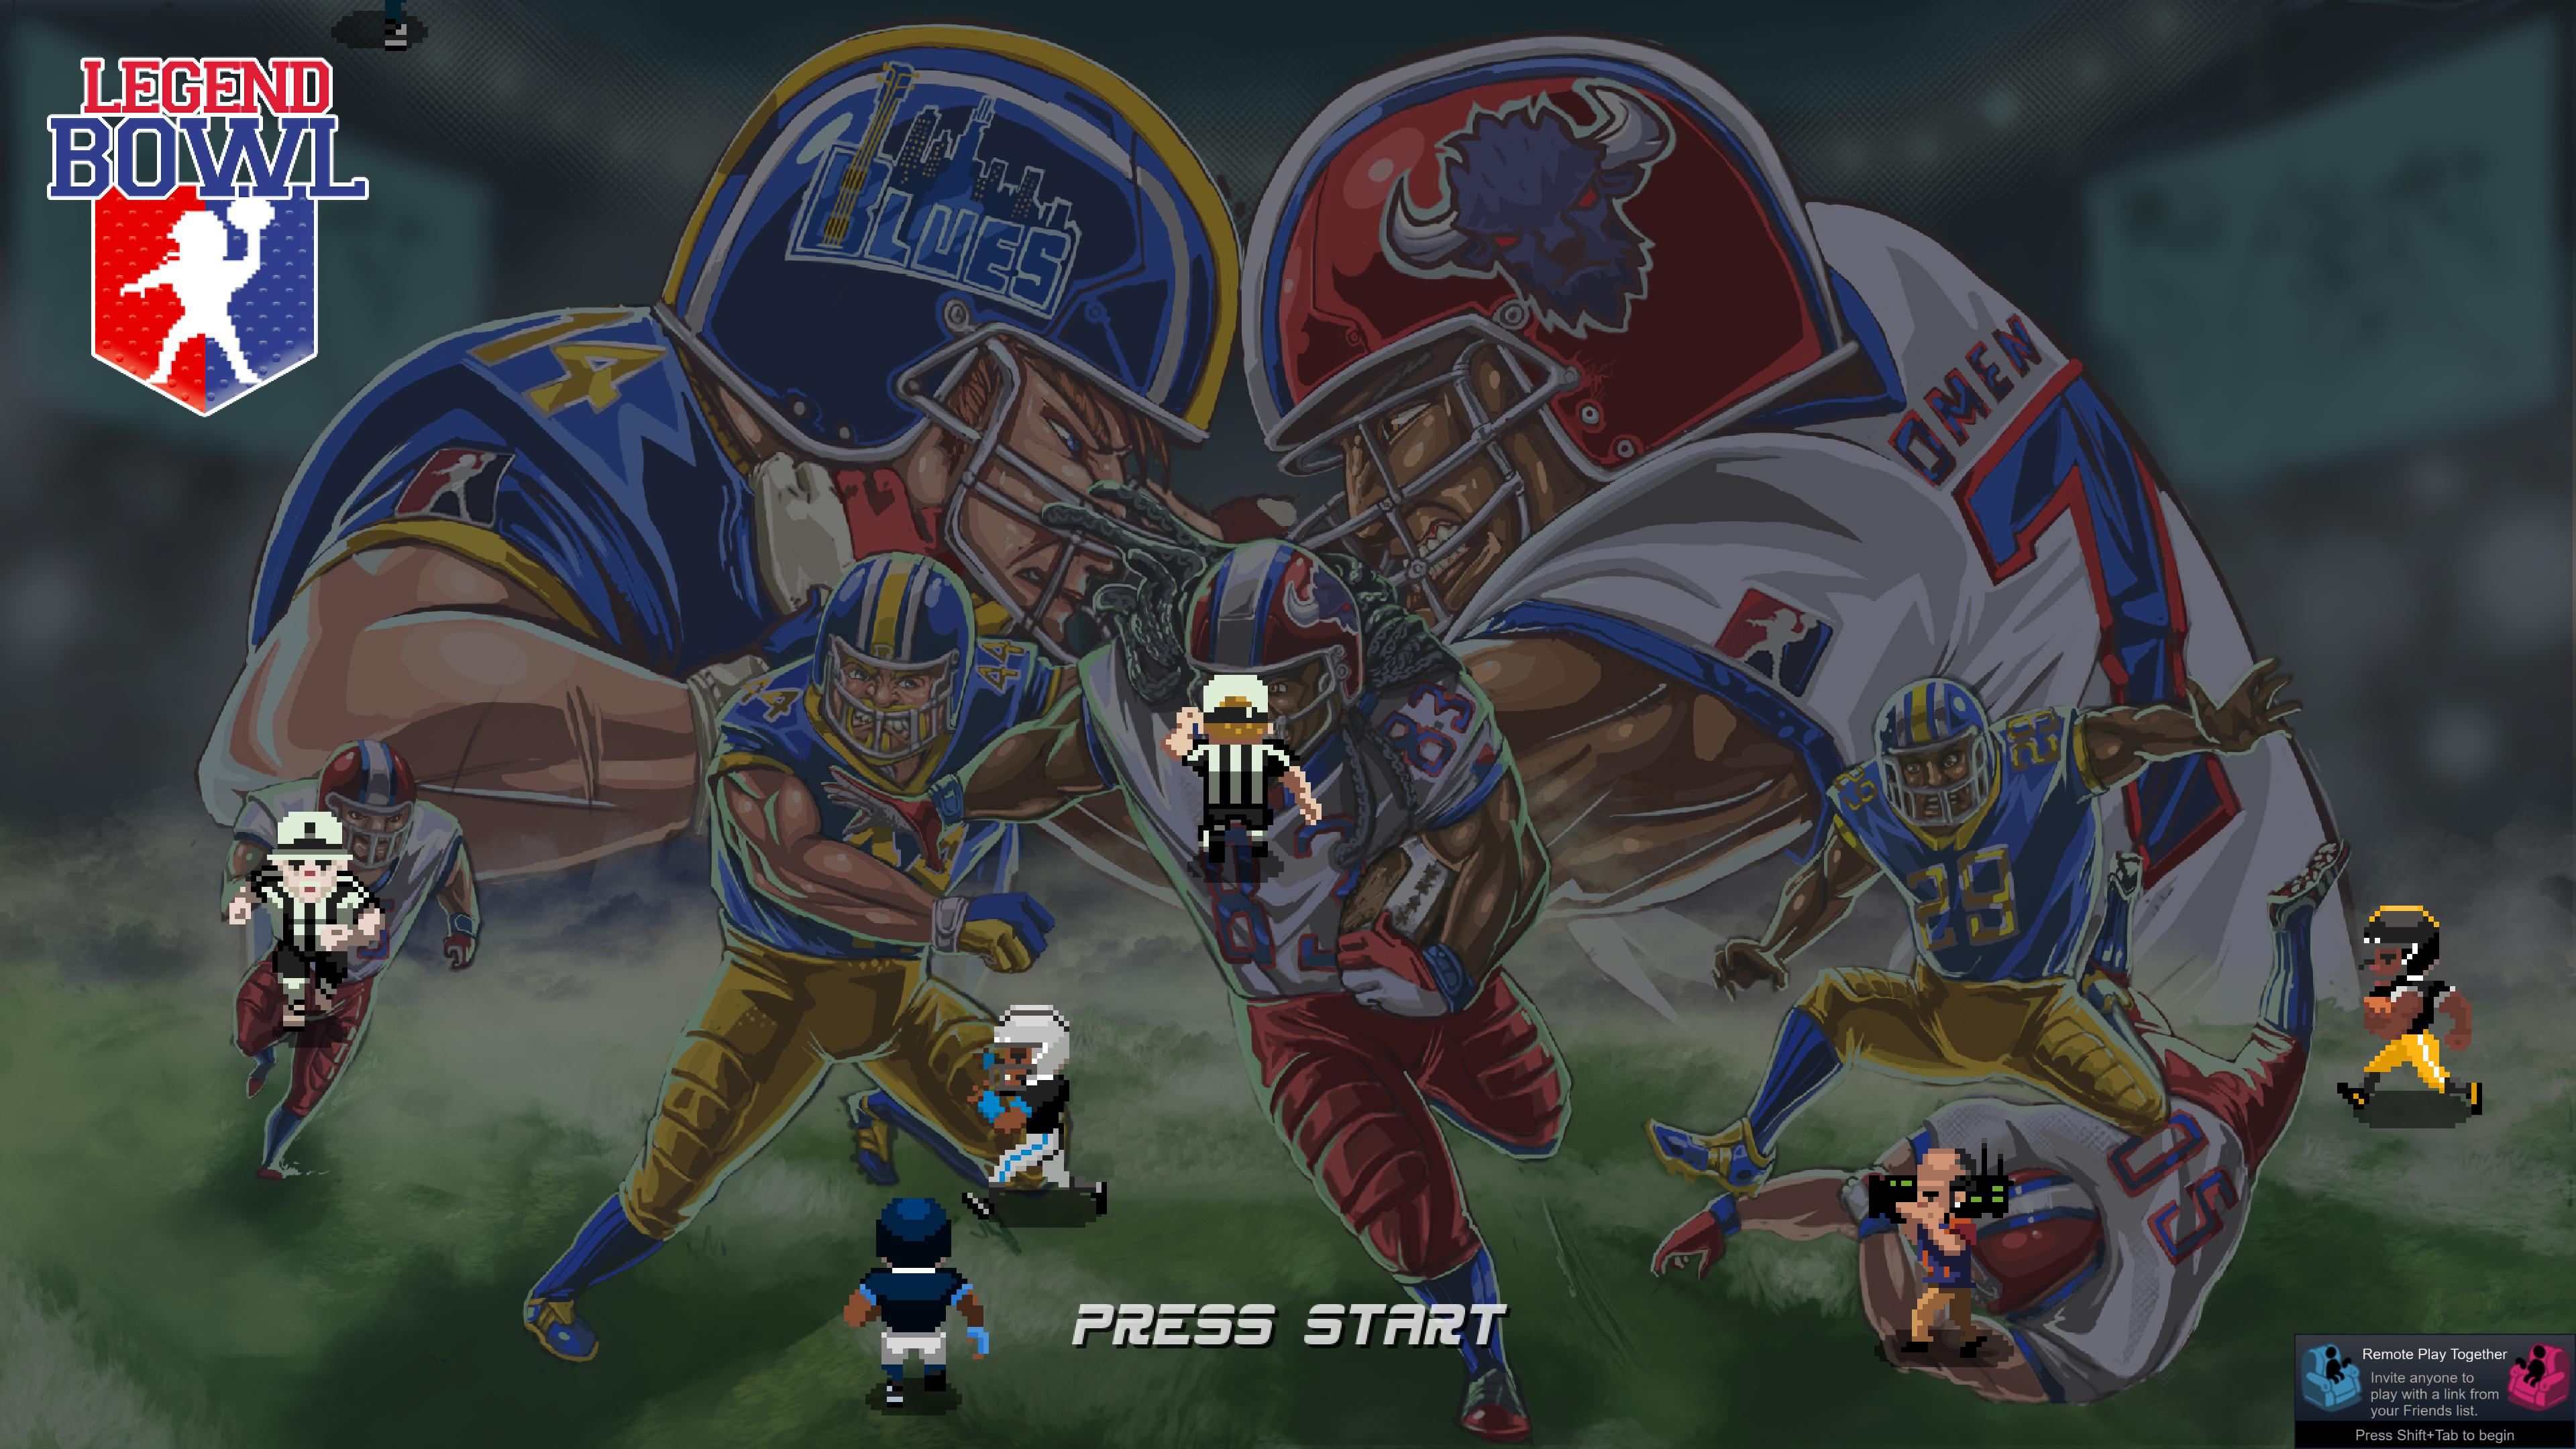 Legend Bowl Screenshot 2021.09.08 - 16.57.23.95